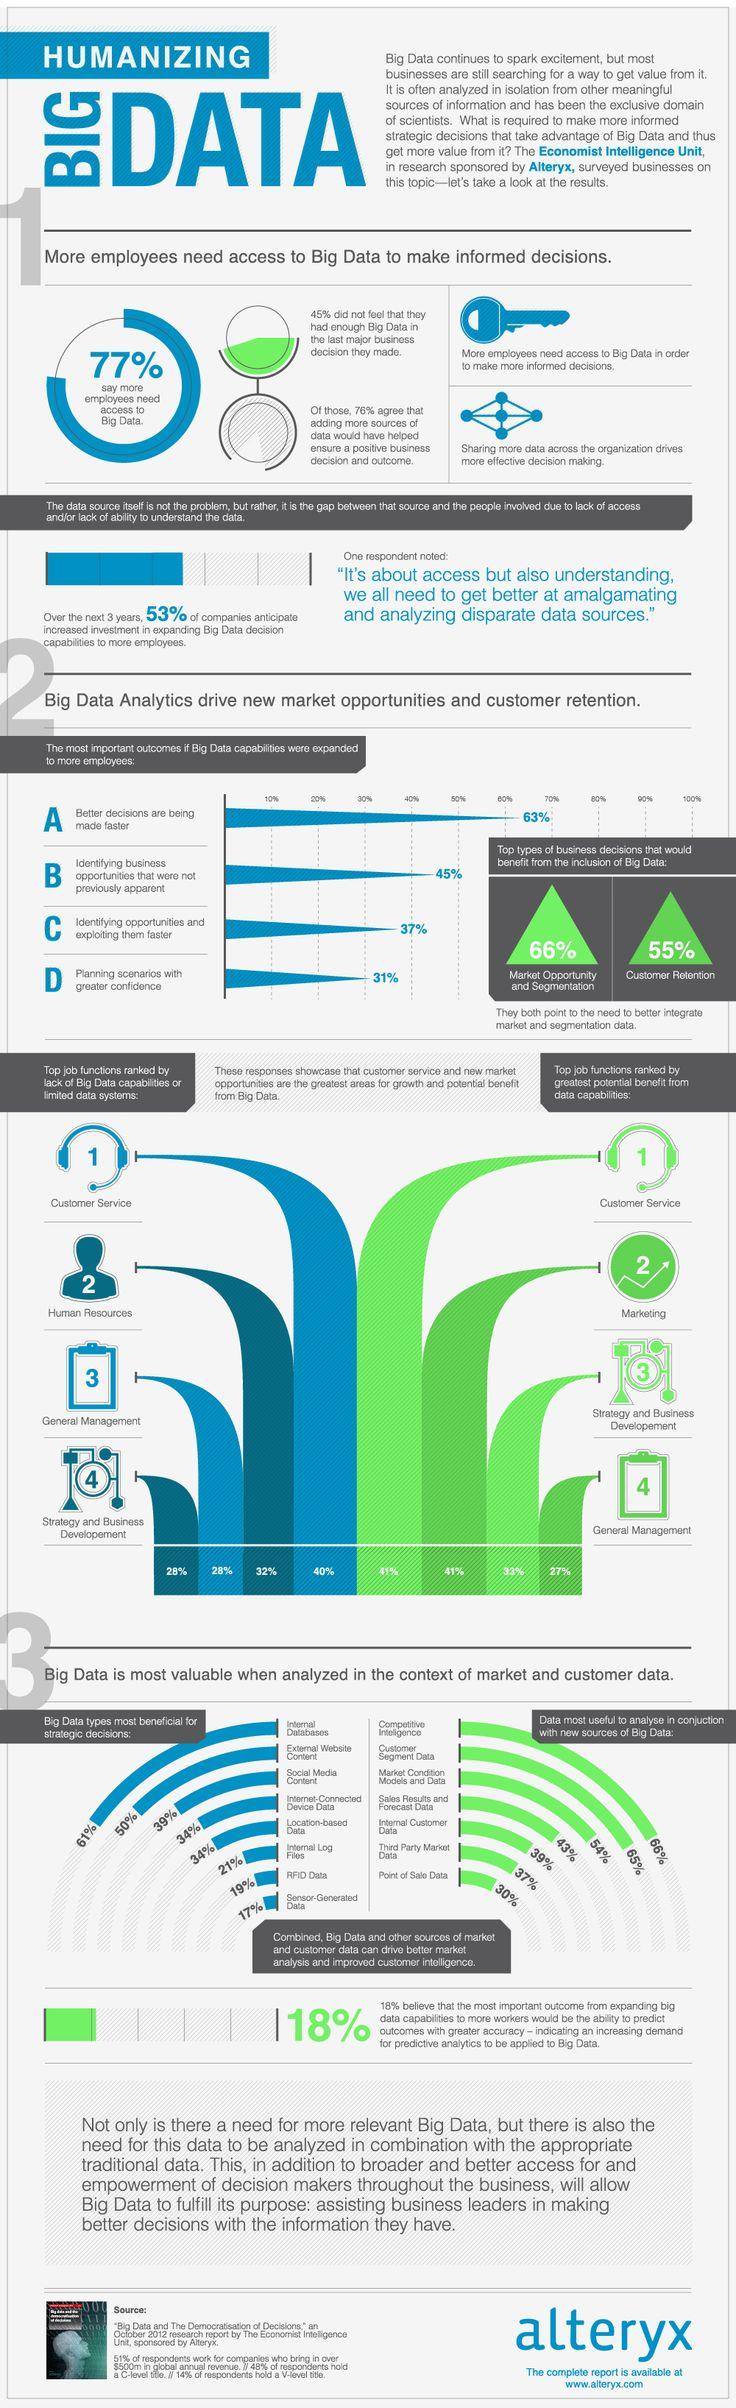 Humanizing Big Data #infographic